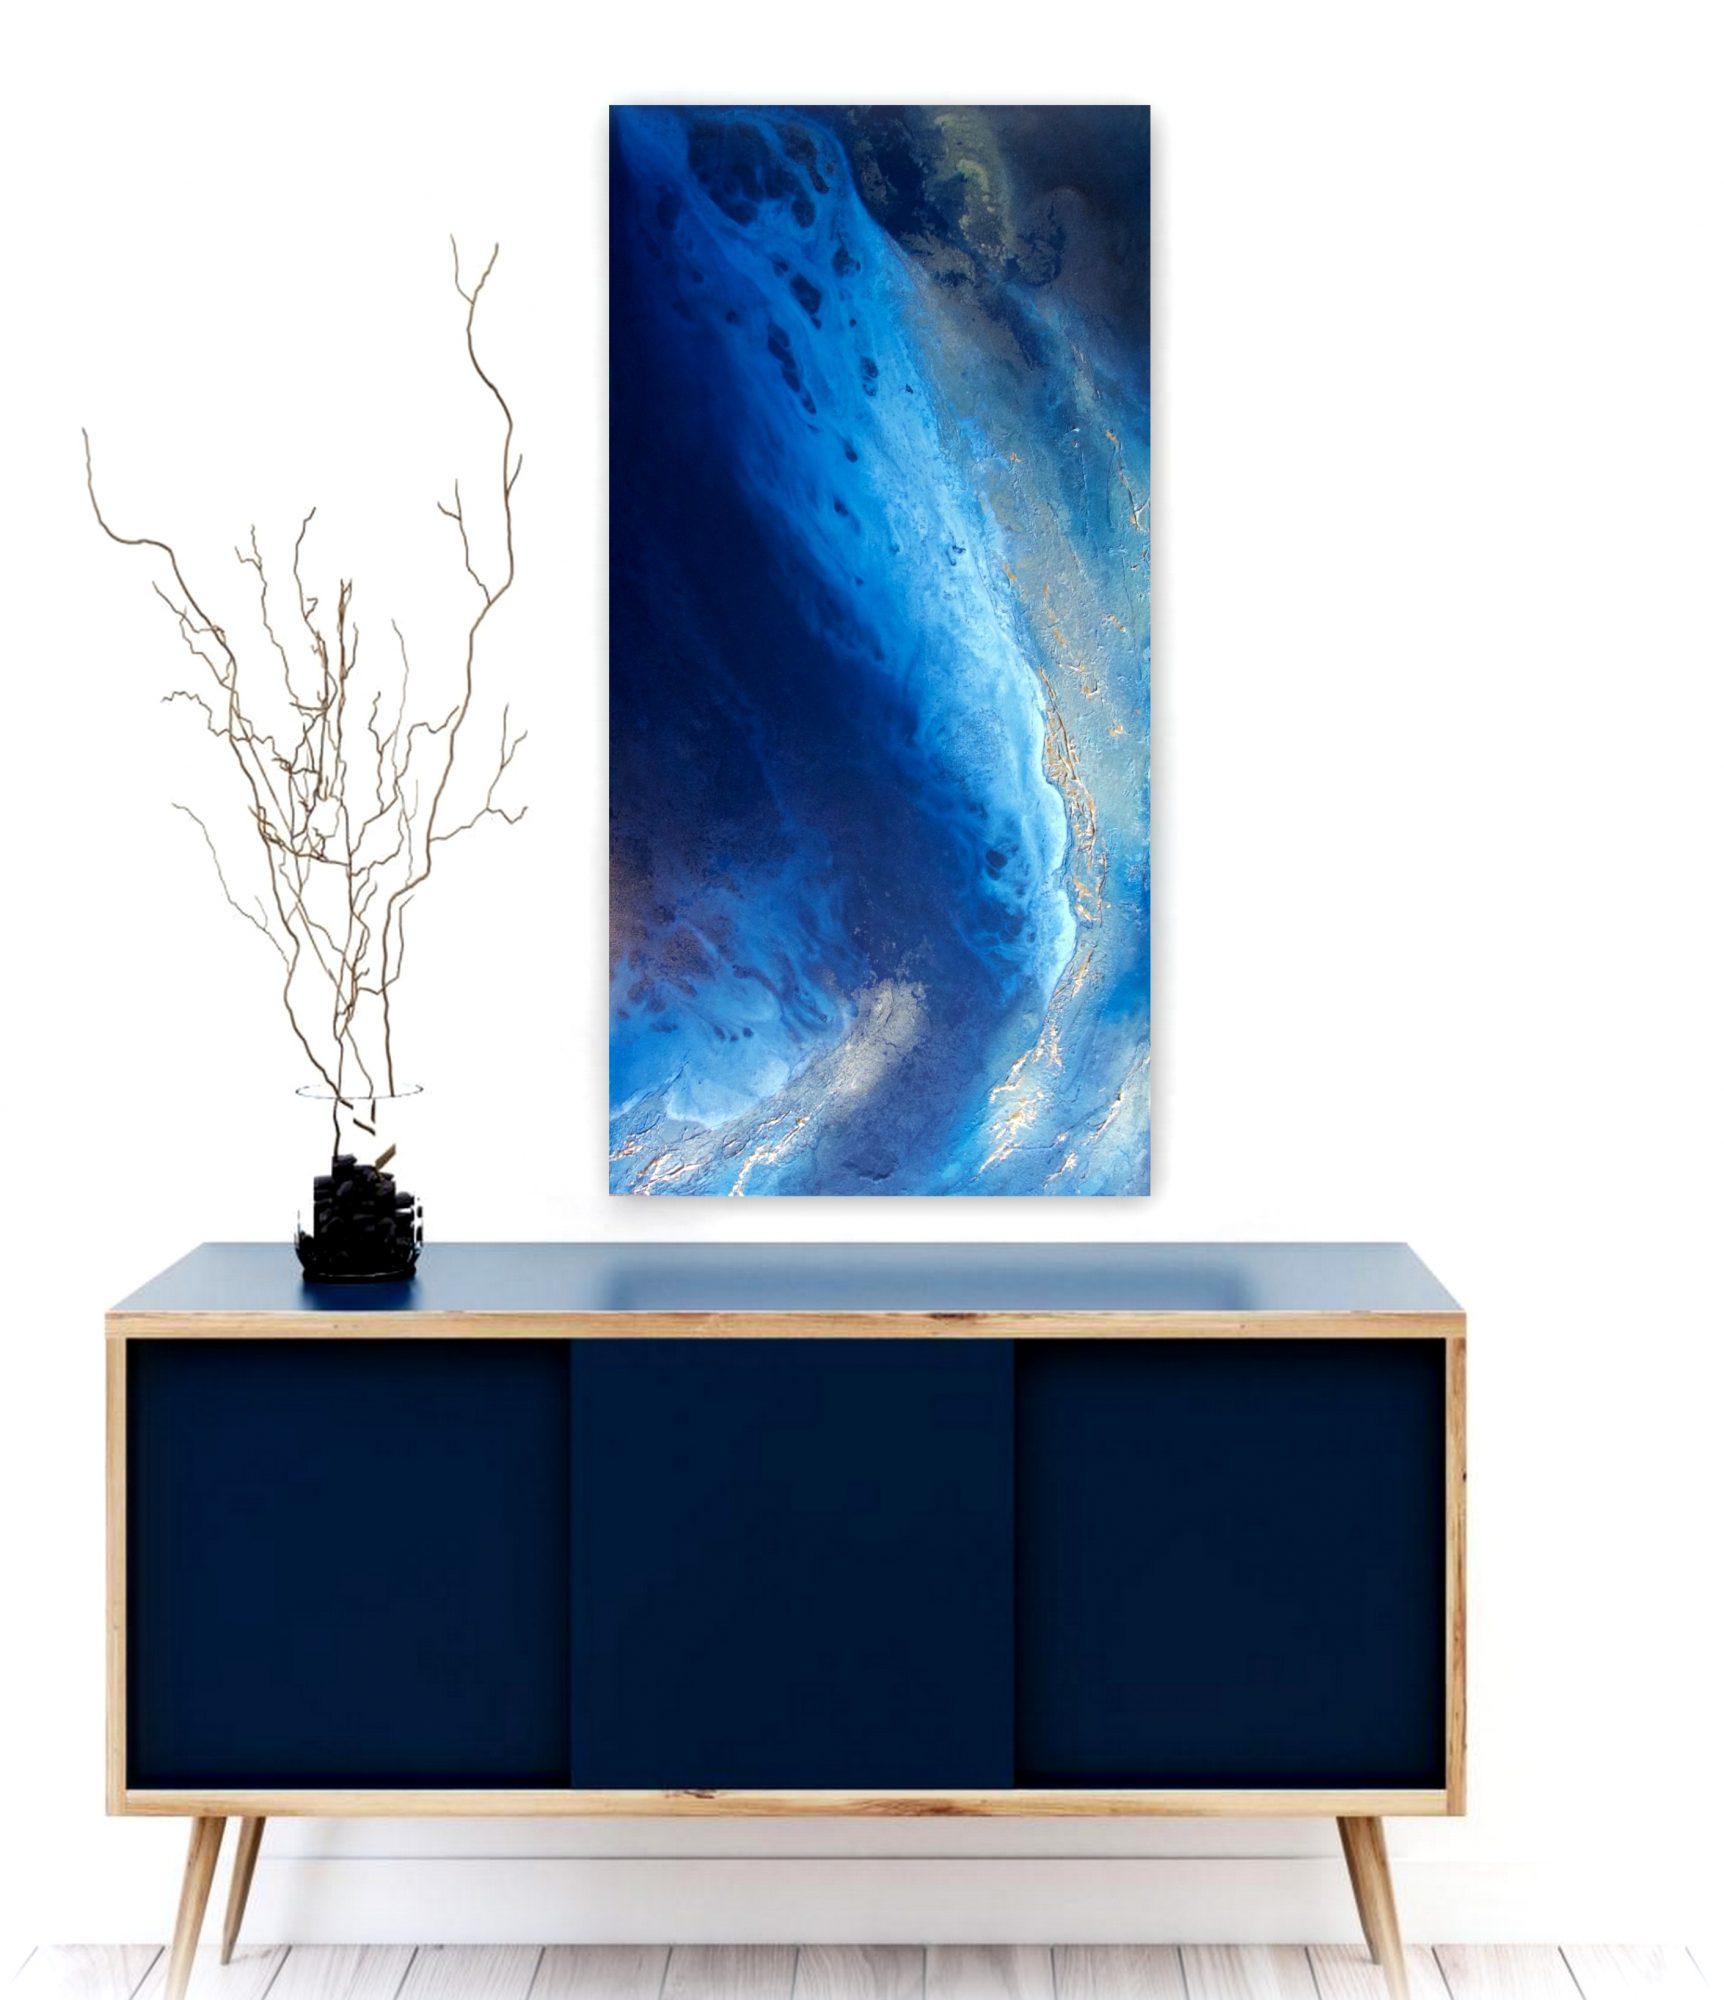 Coral Coastline Painting By Petra Meikle De Vlas.jpg6